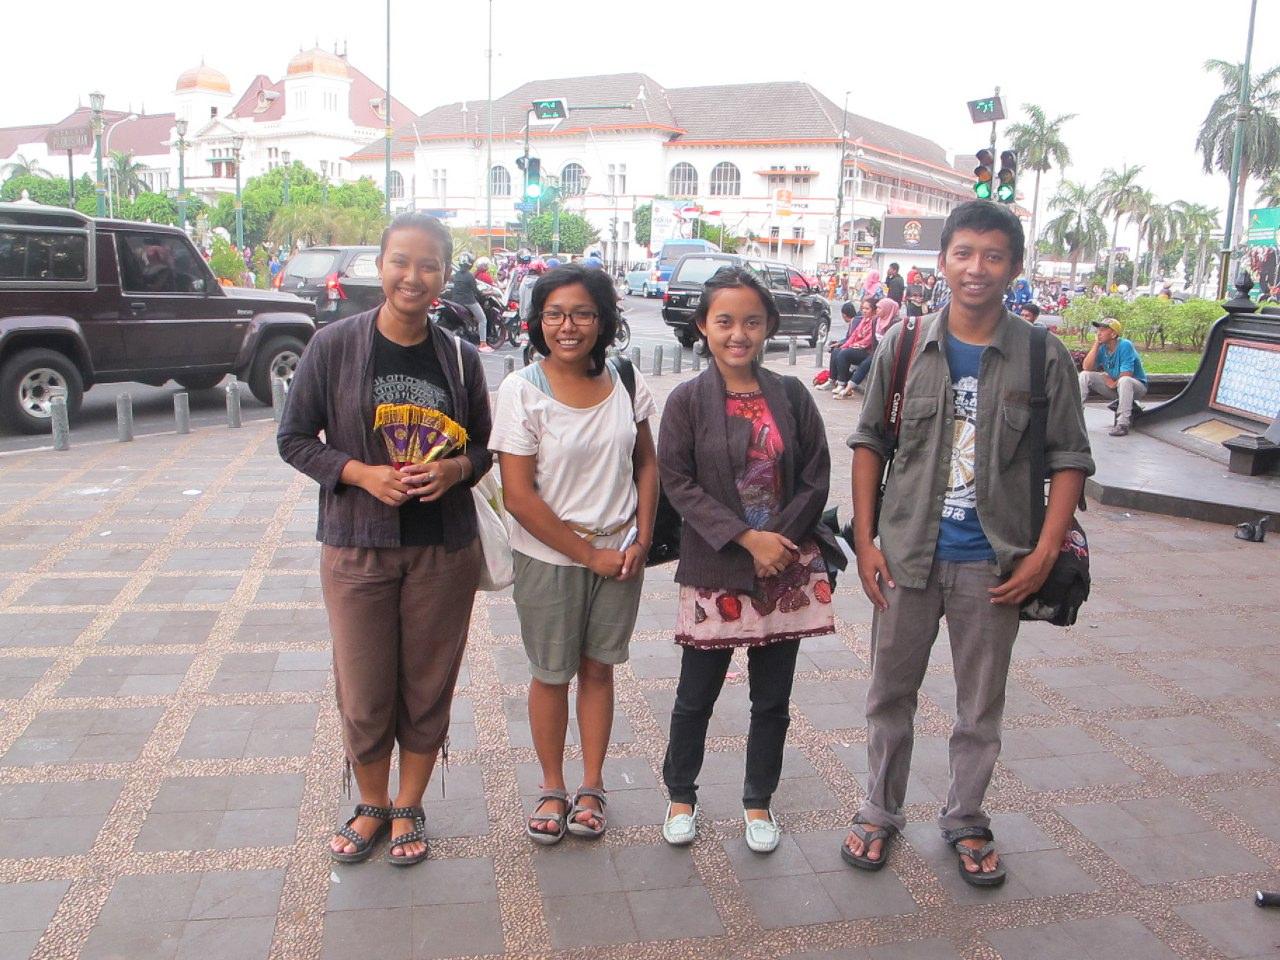 Bersama Ari Dhamayanti, Sazkia Noor Anggraini dan Faizal Afnan